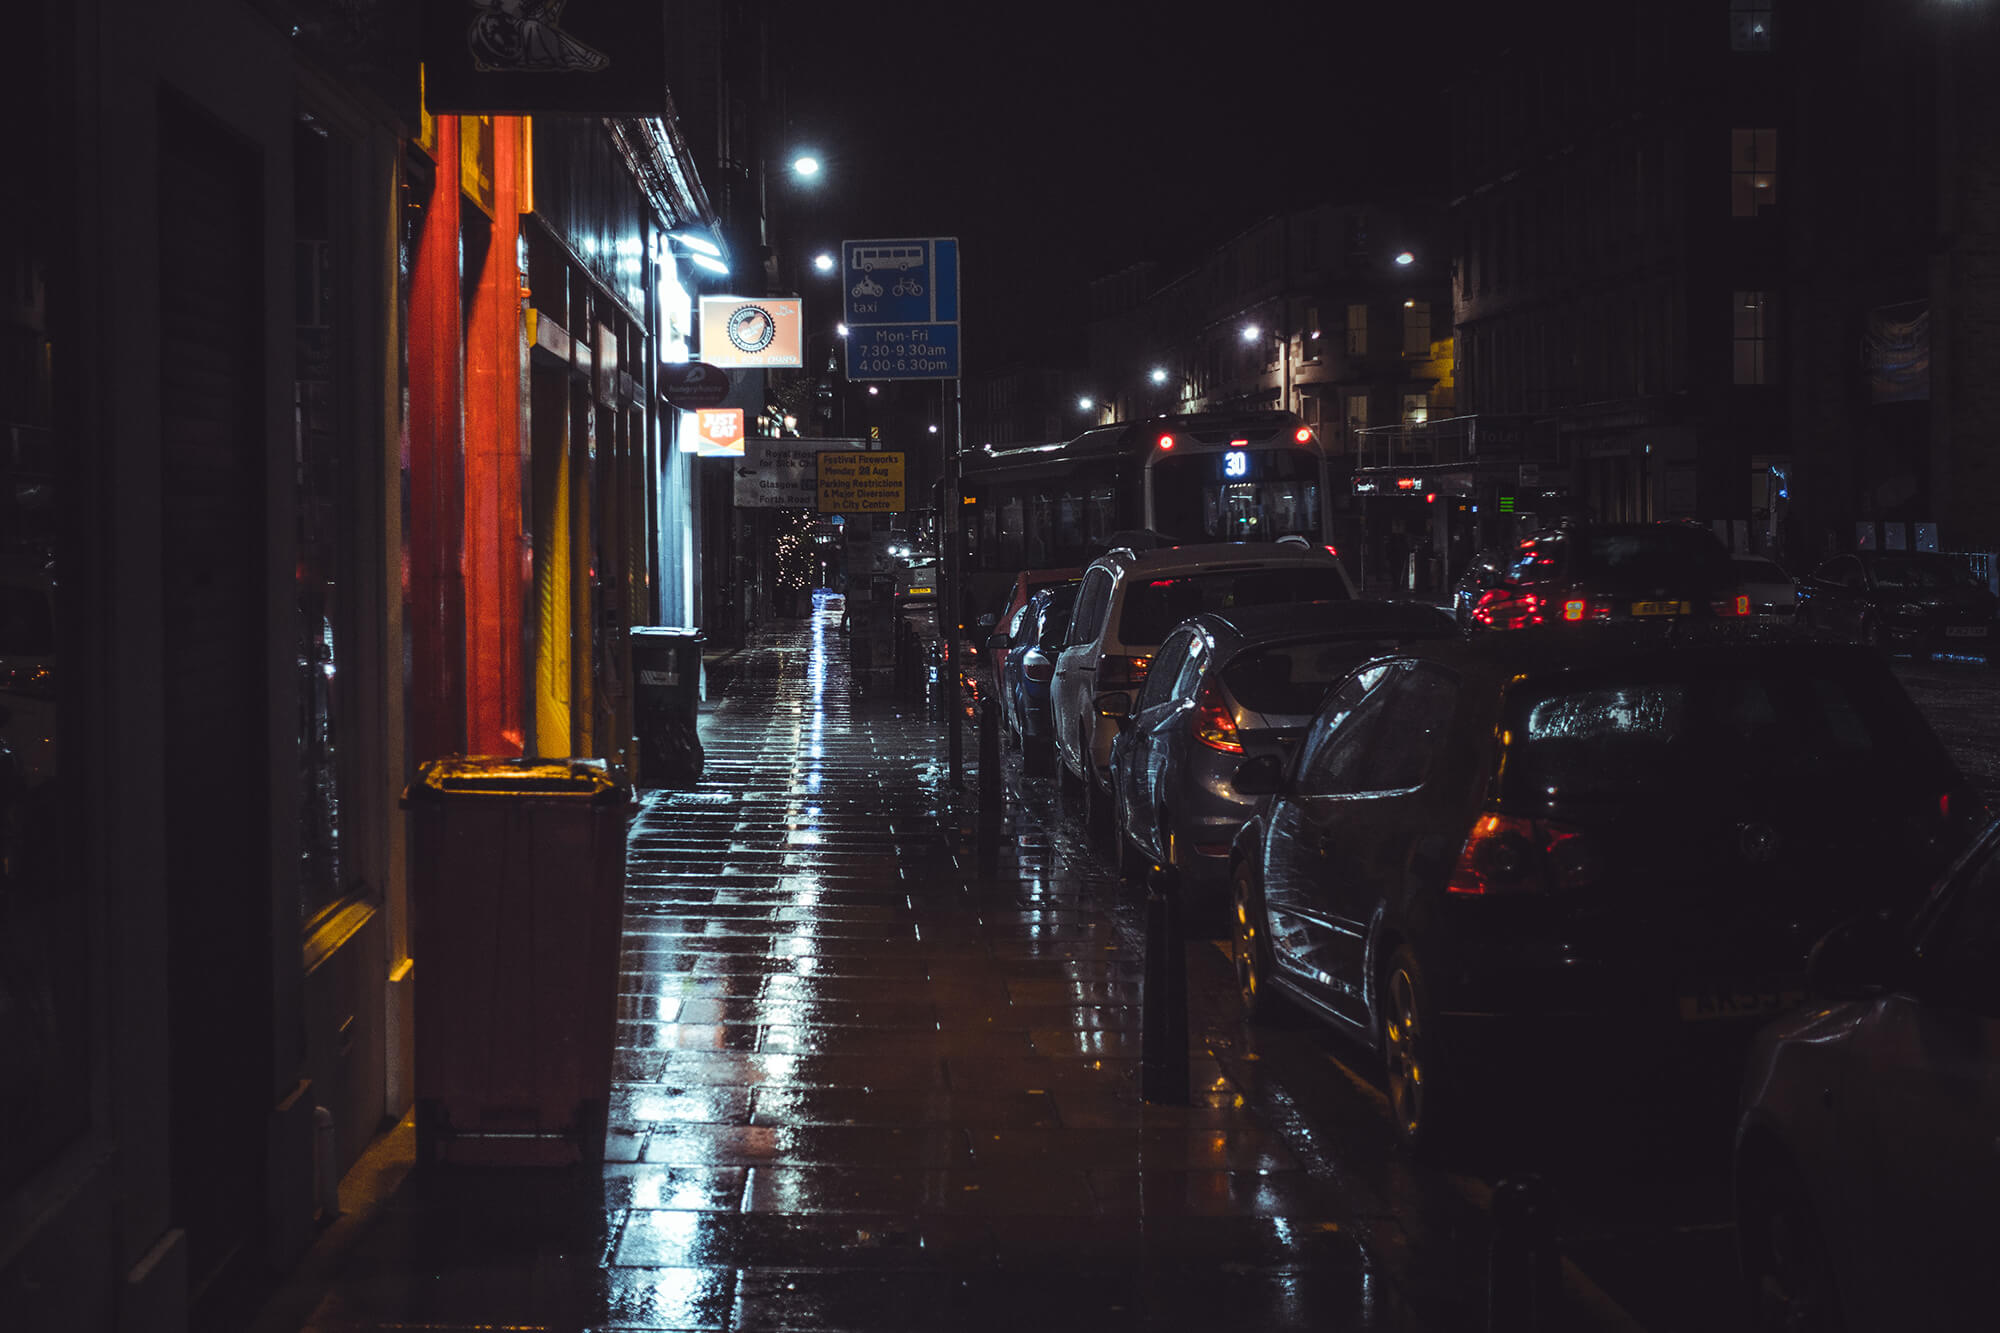 Edimbourg la nuit